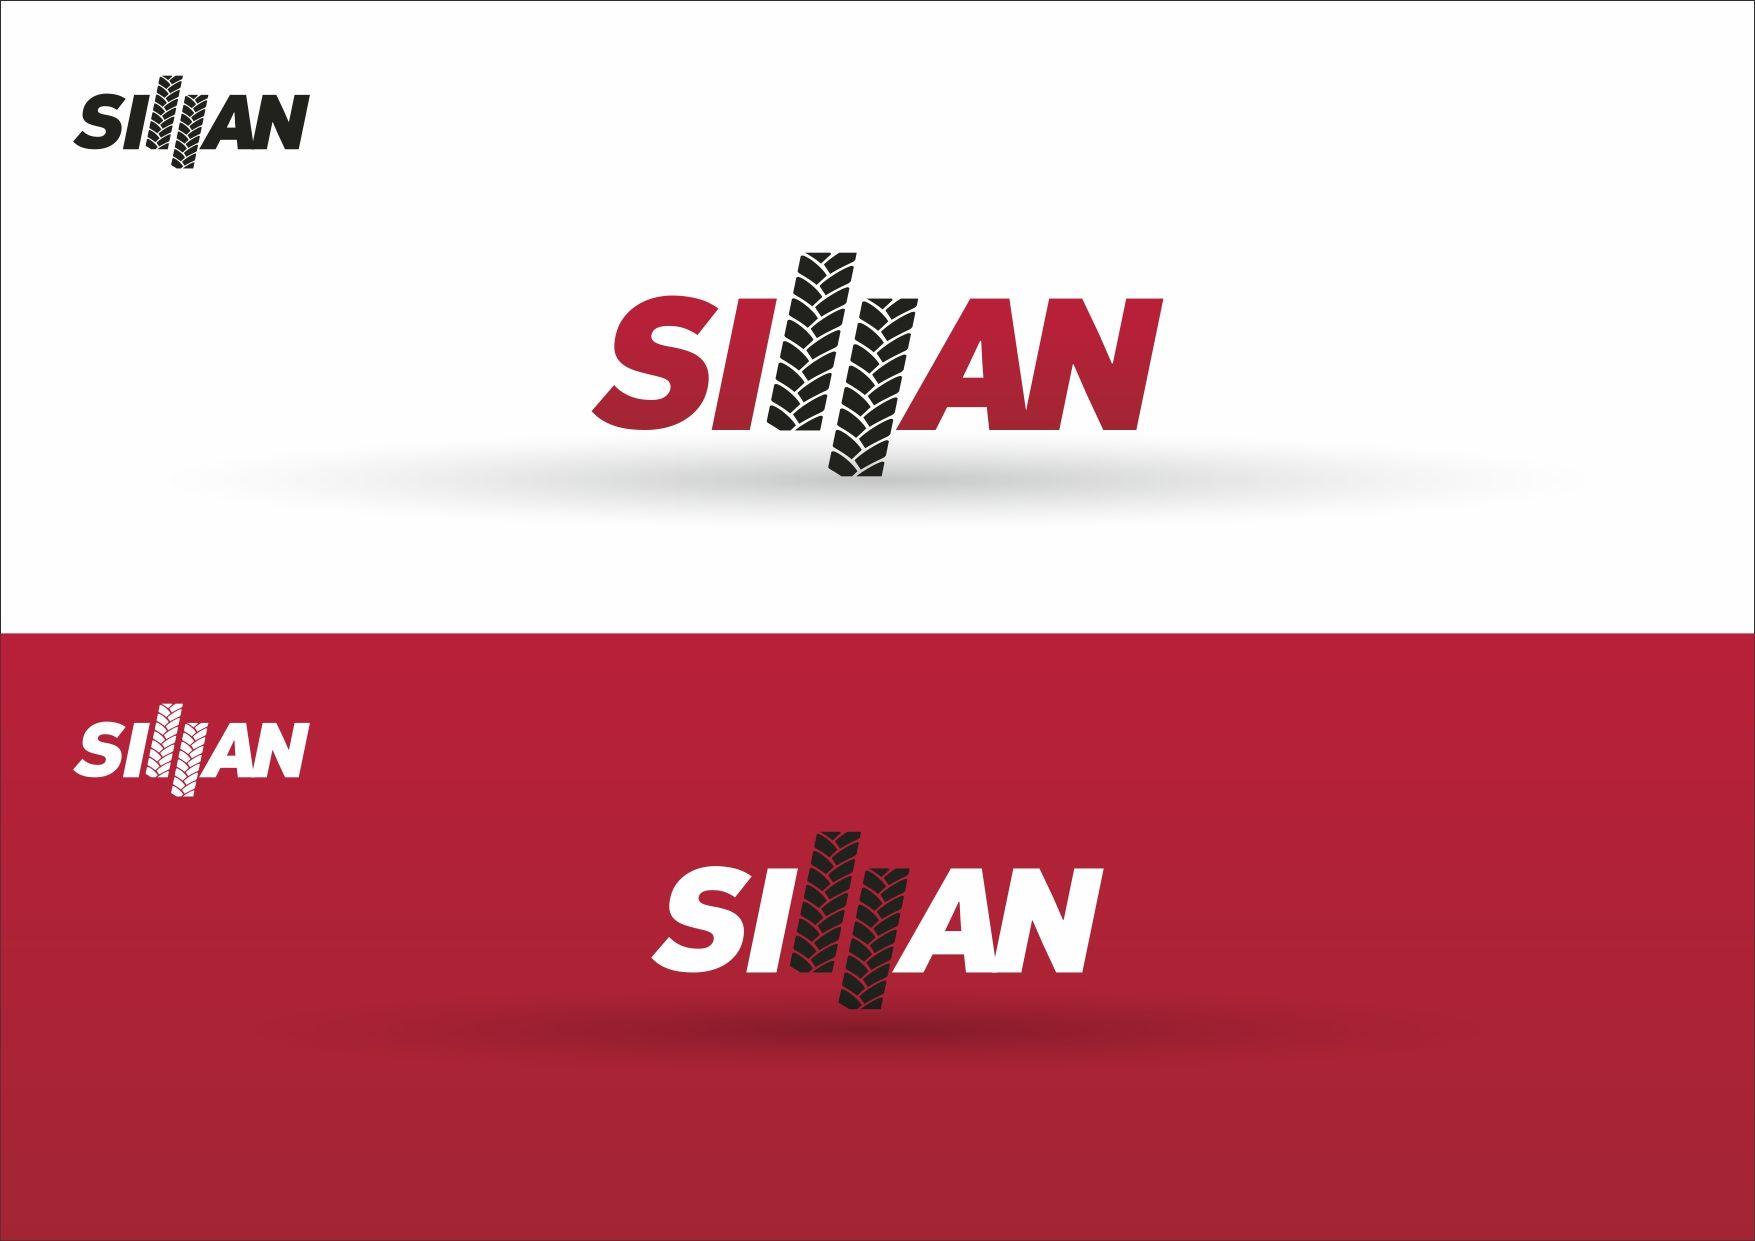 Логотип для Sillan - дизайнер NaCl